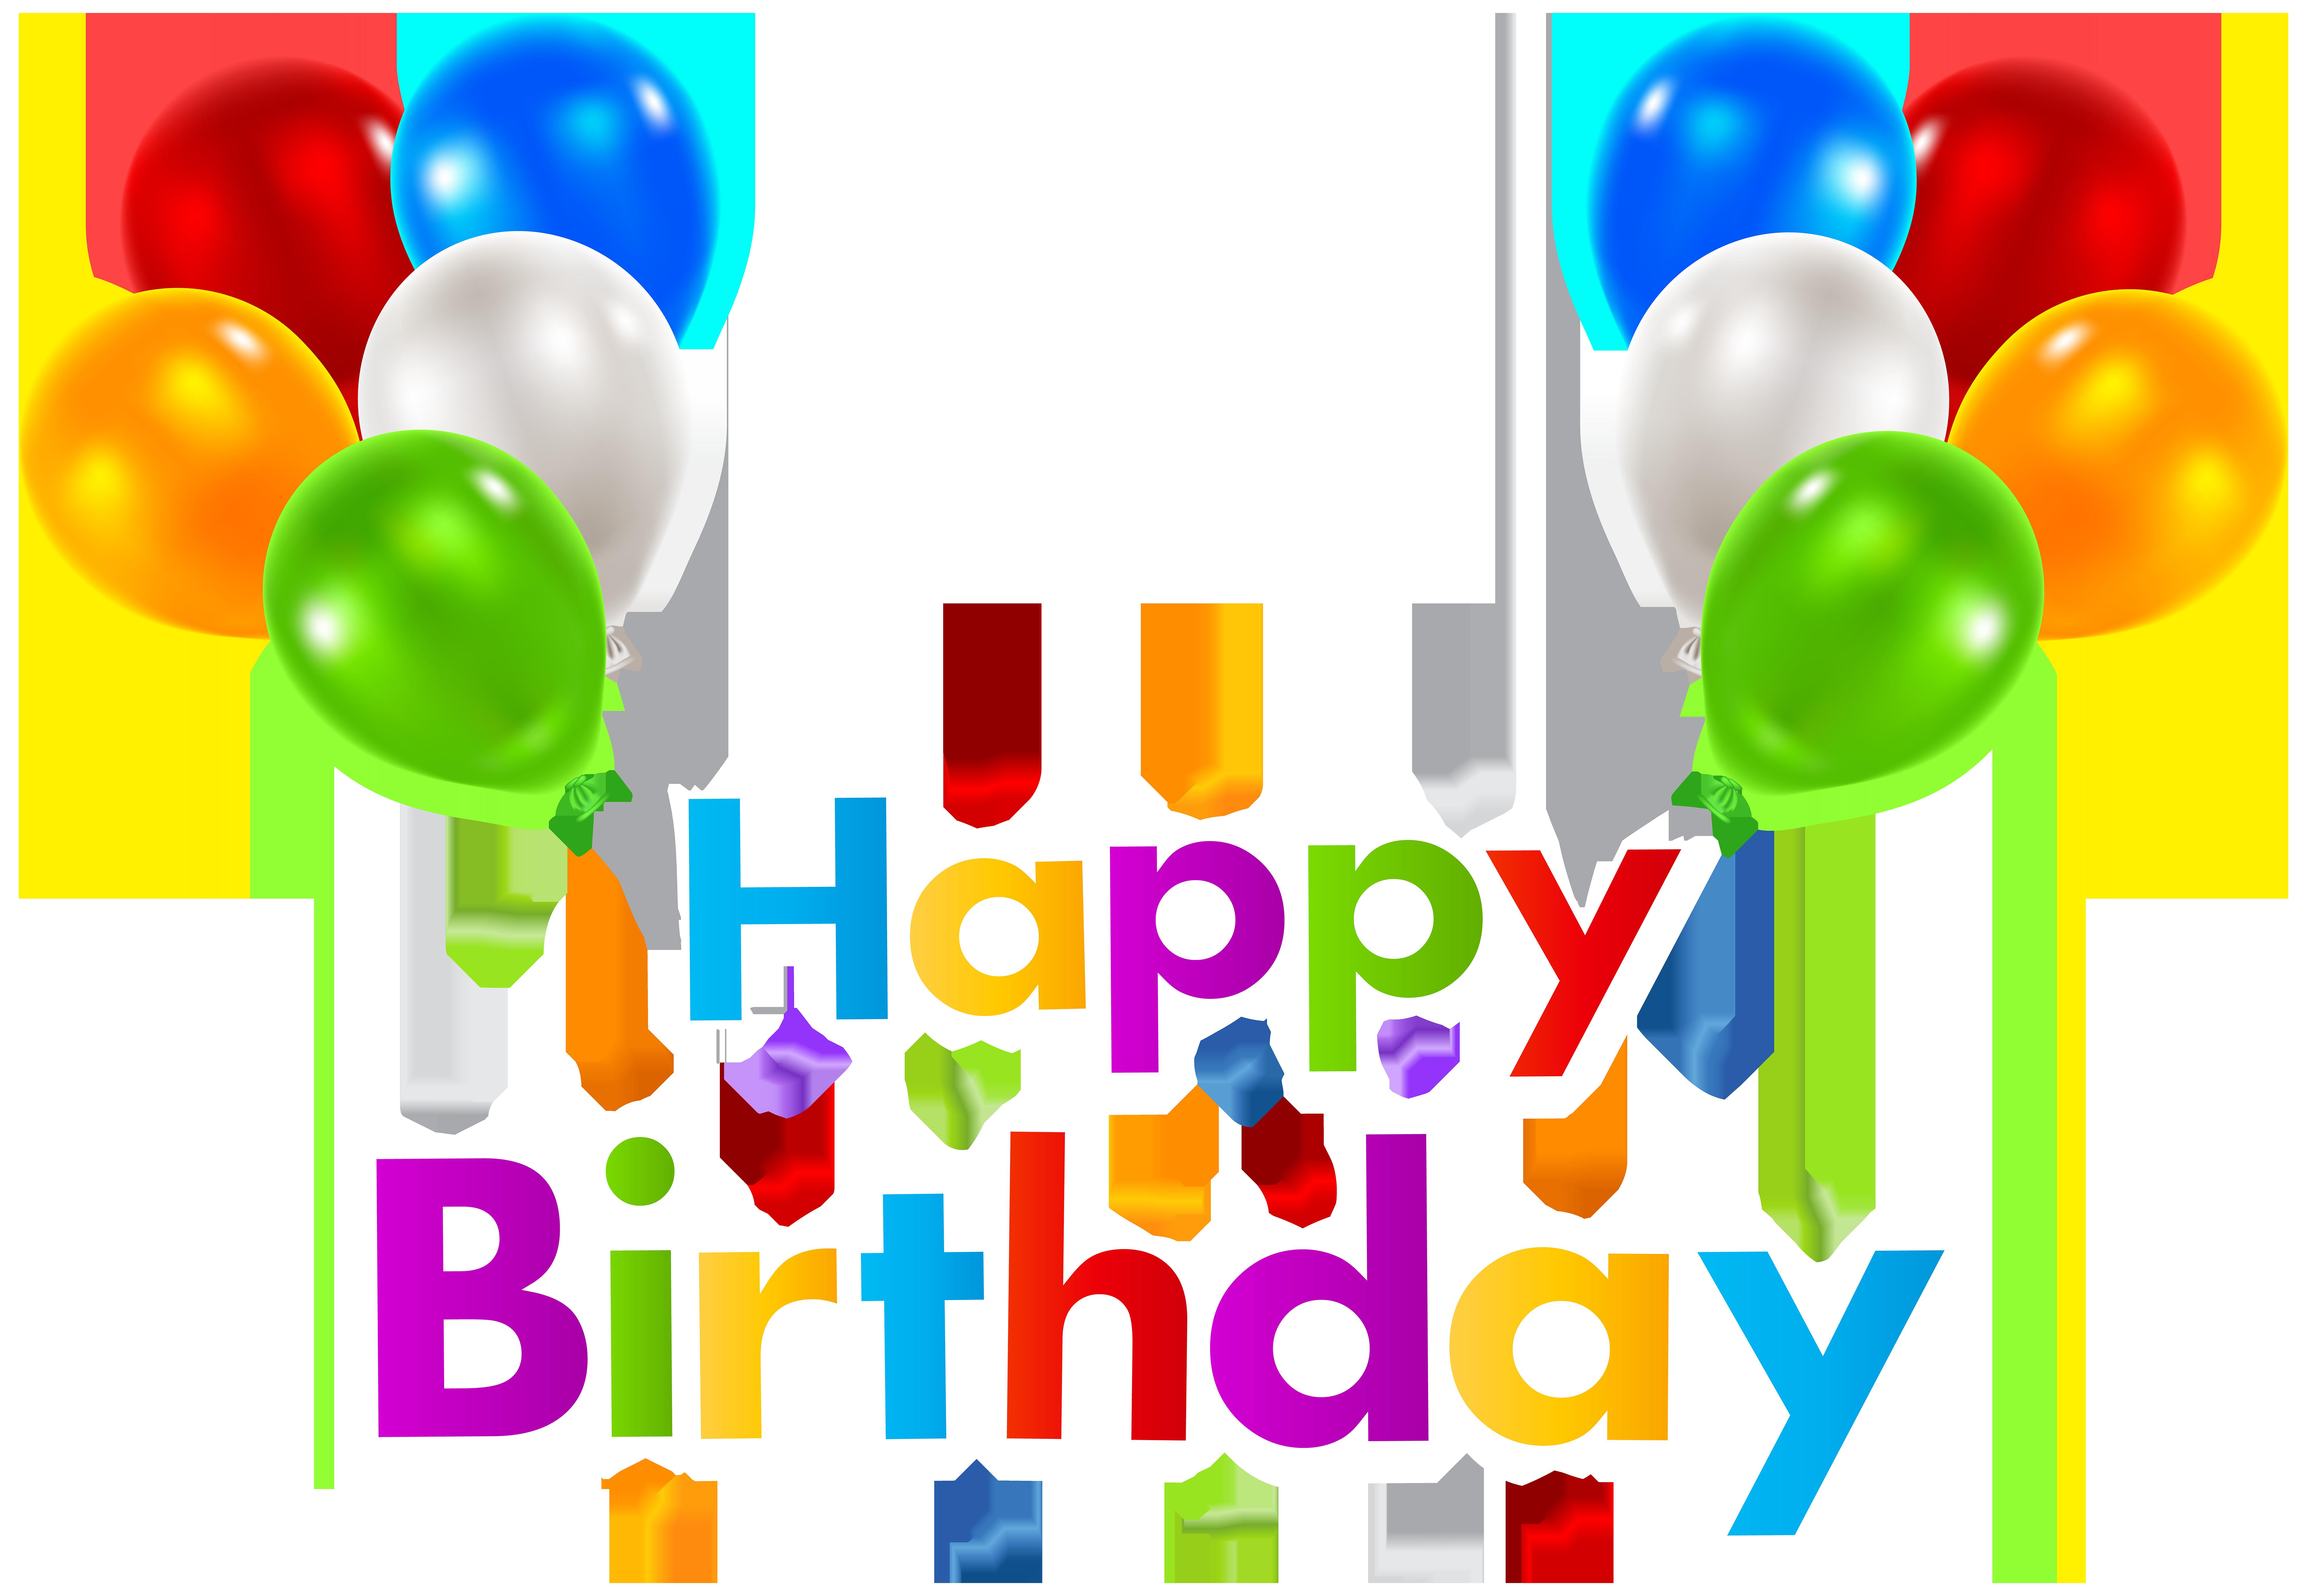 Pin by digital effect on birthday birthday background - Happy birthday balloon images hd ...